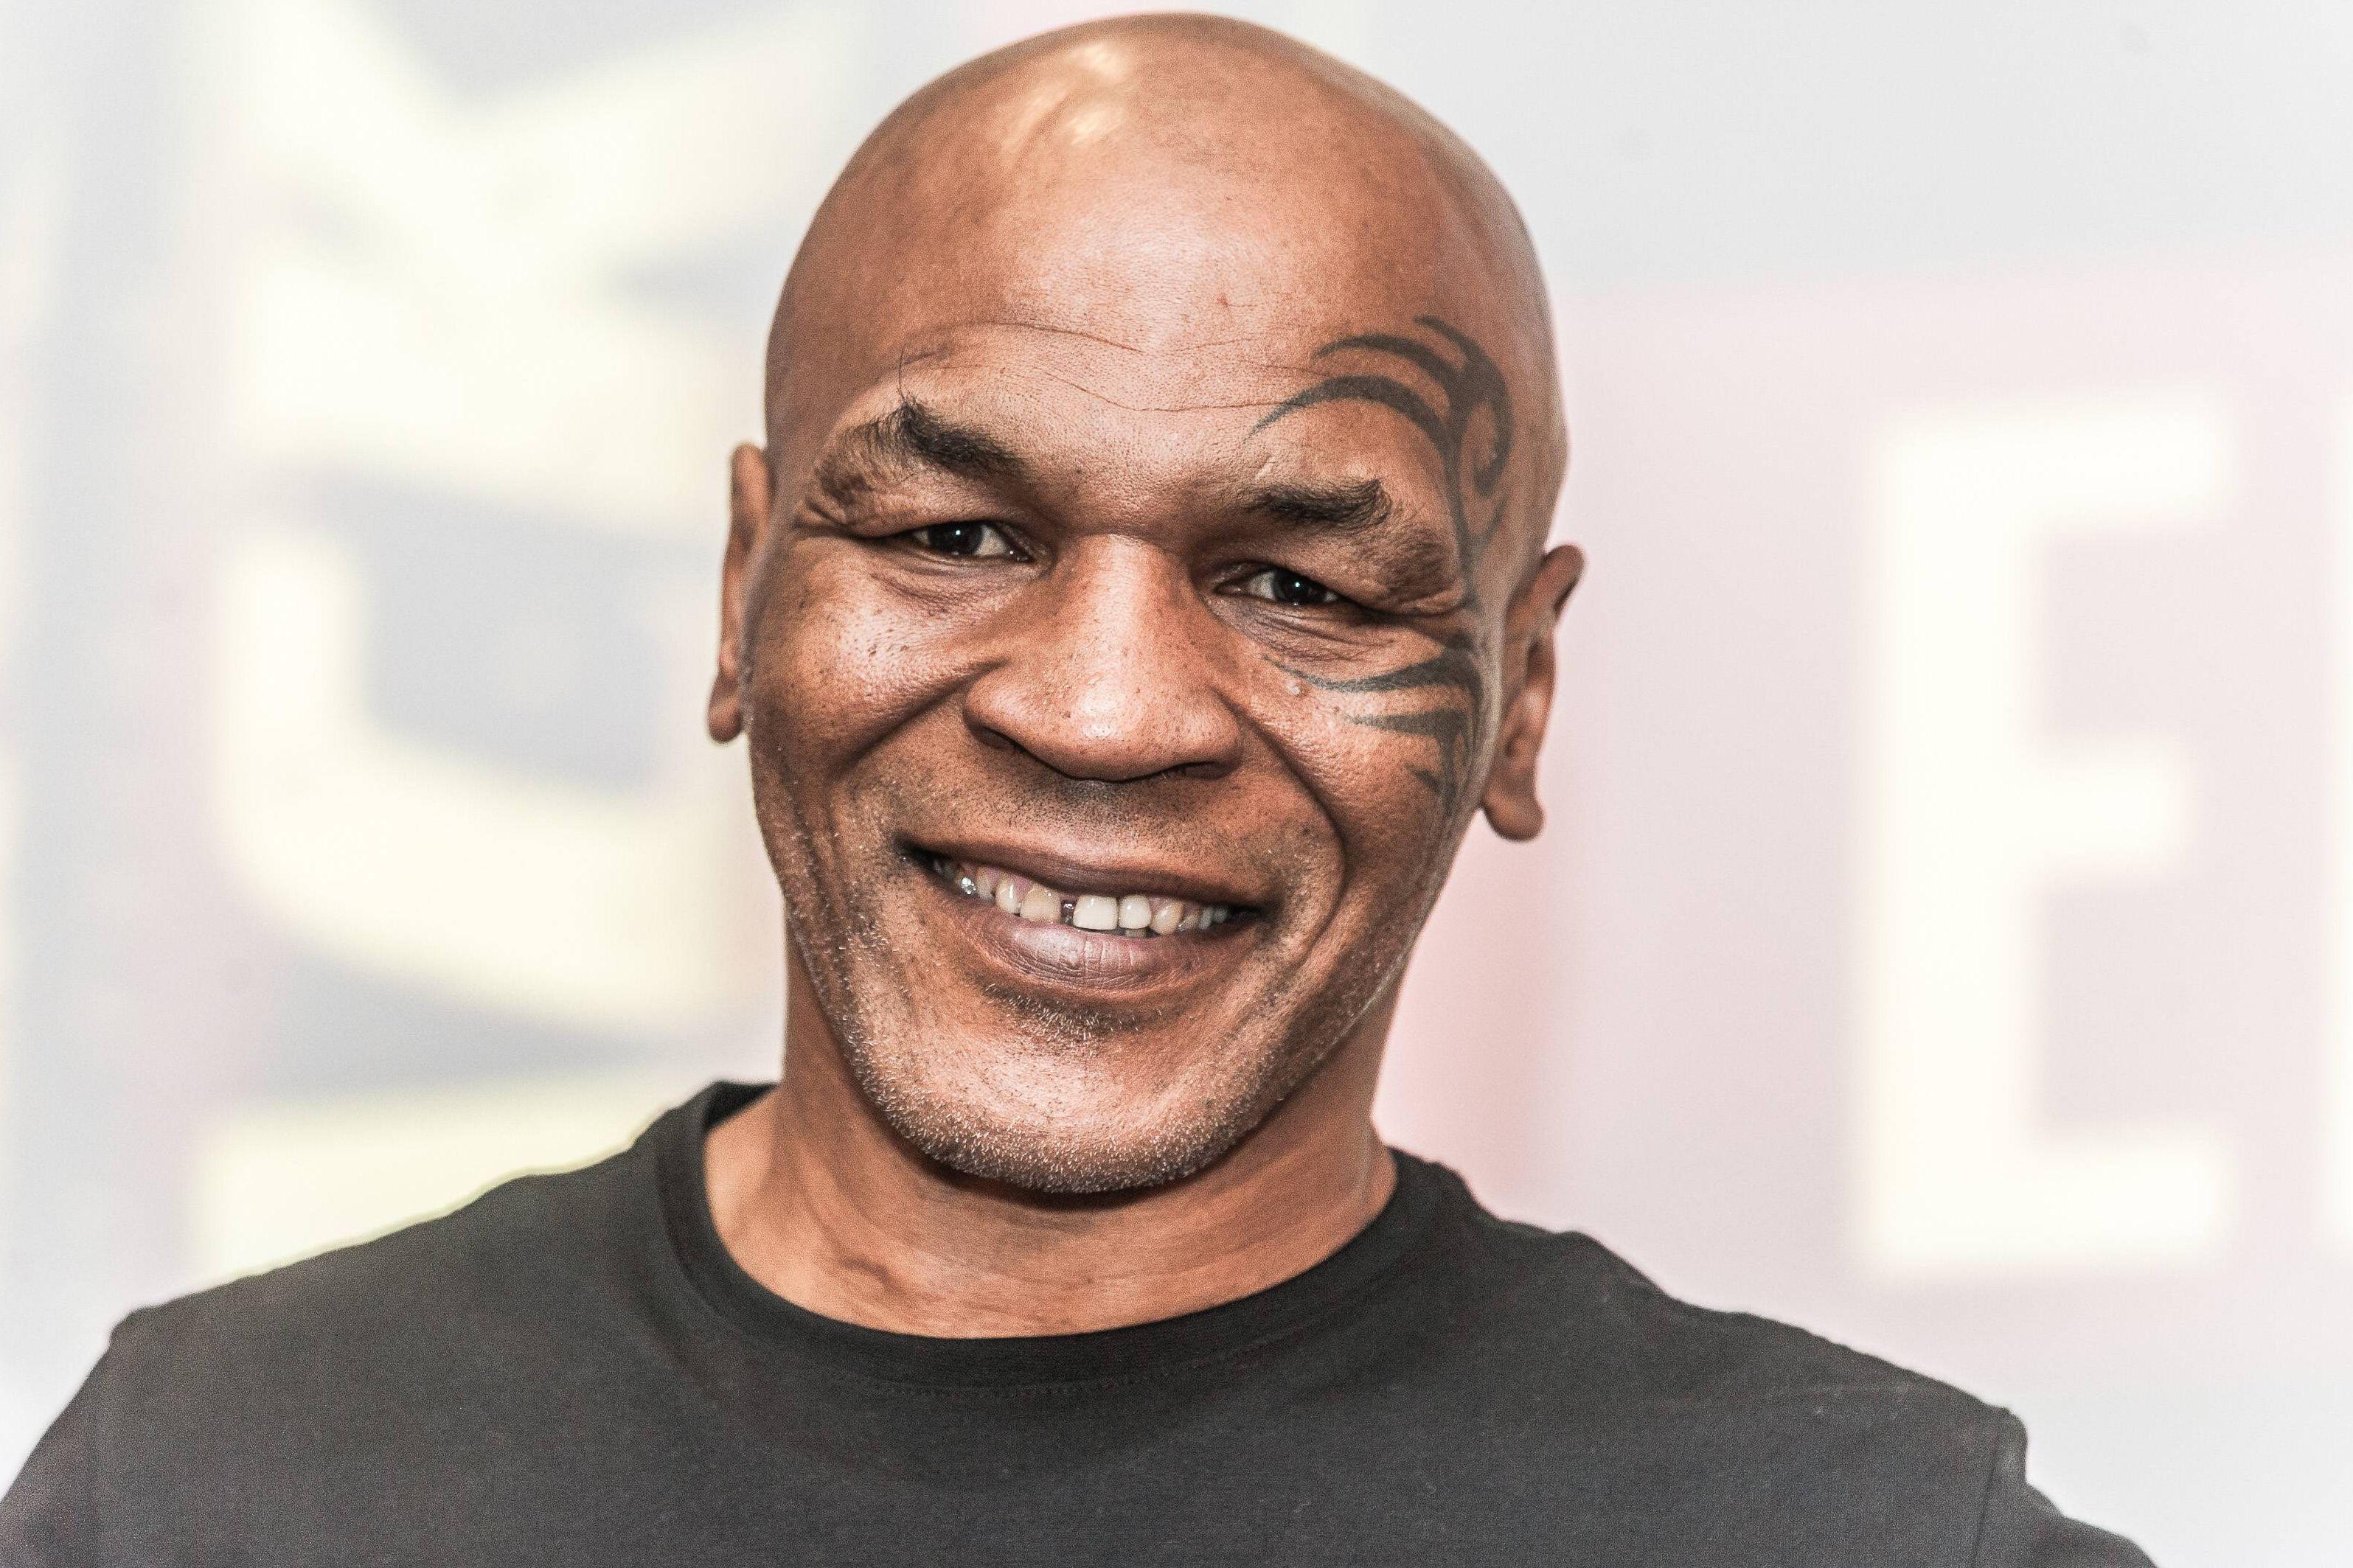 Бокс, Тайсон - Джонс, прямая текстовая онлайн трансляция боя